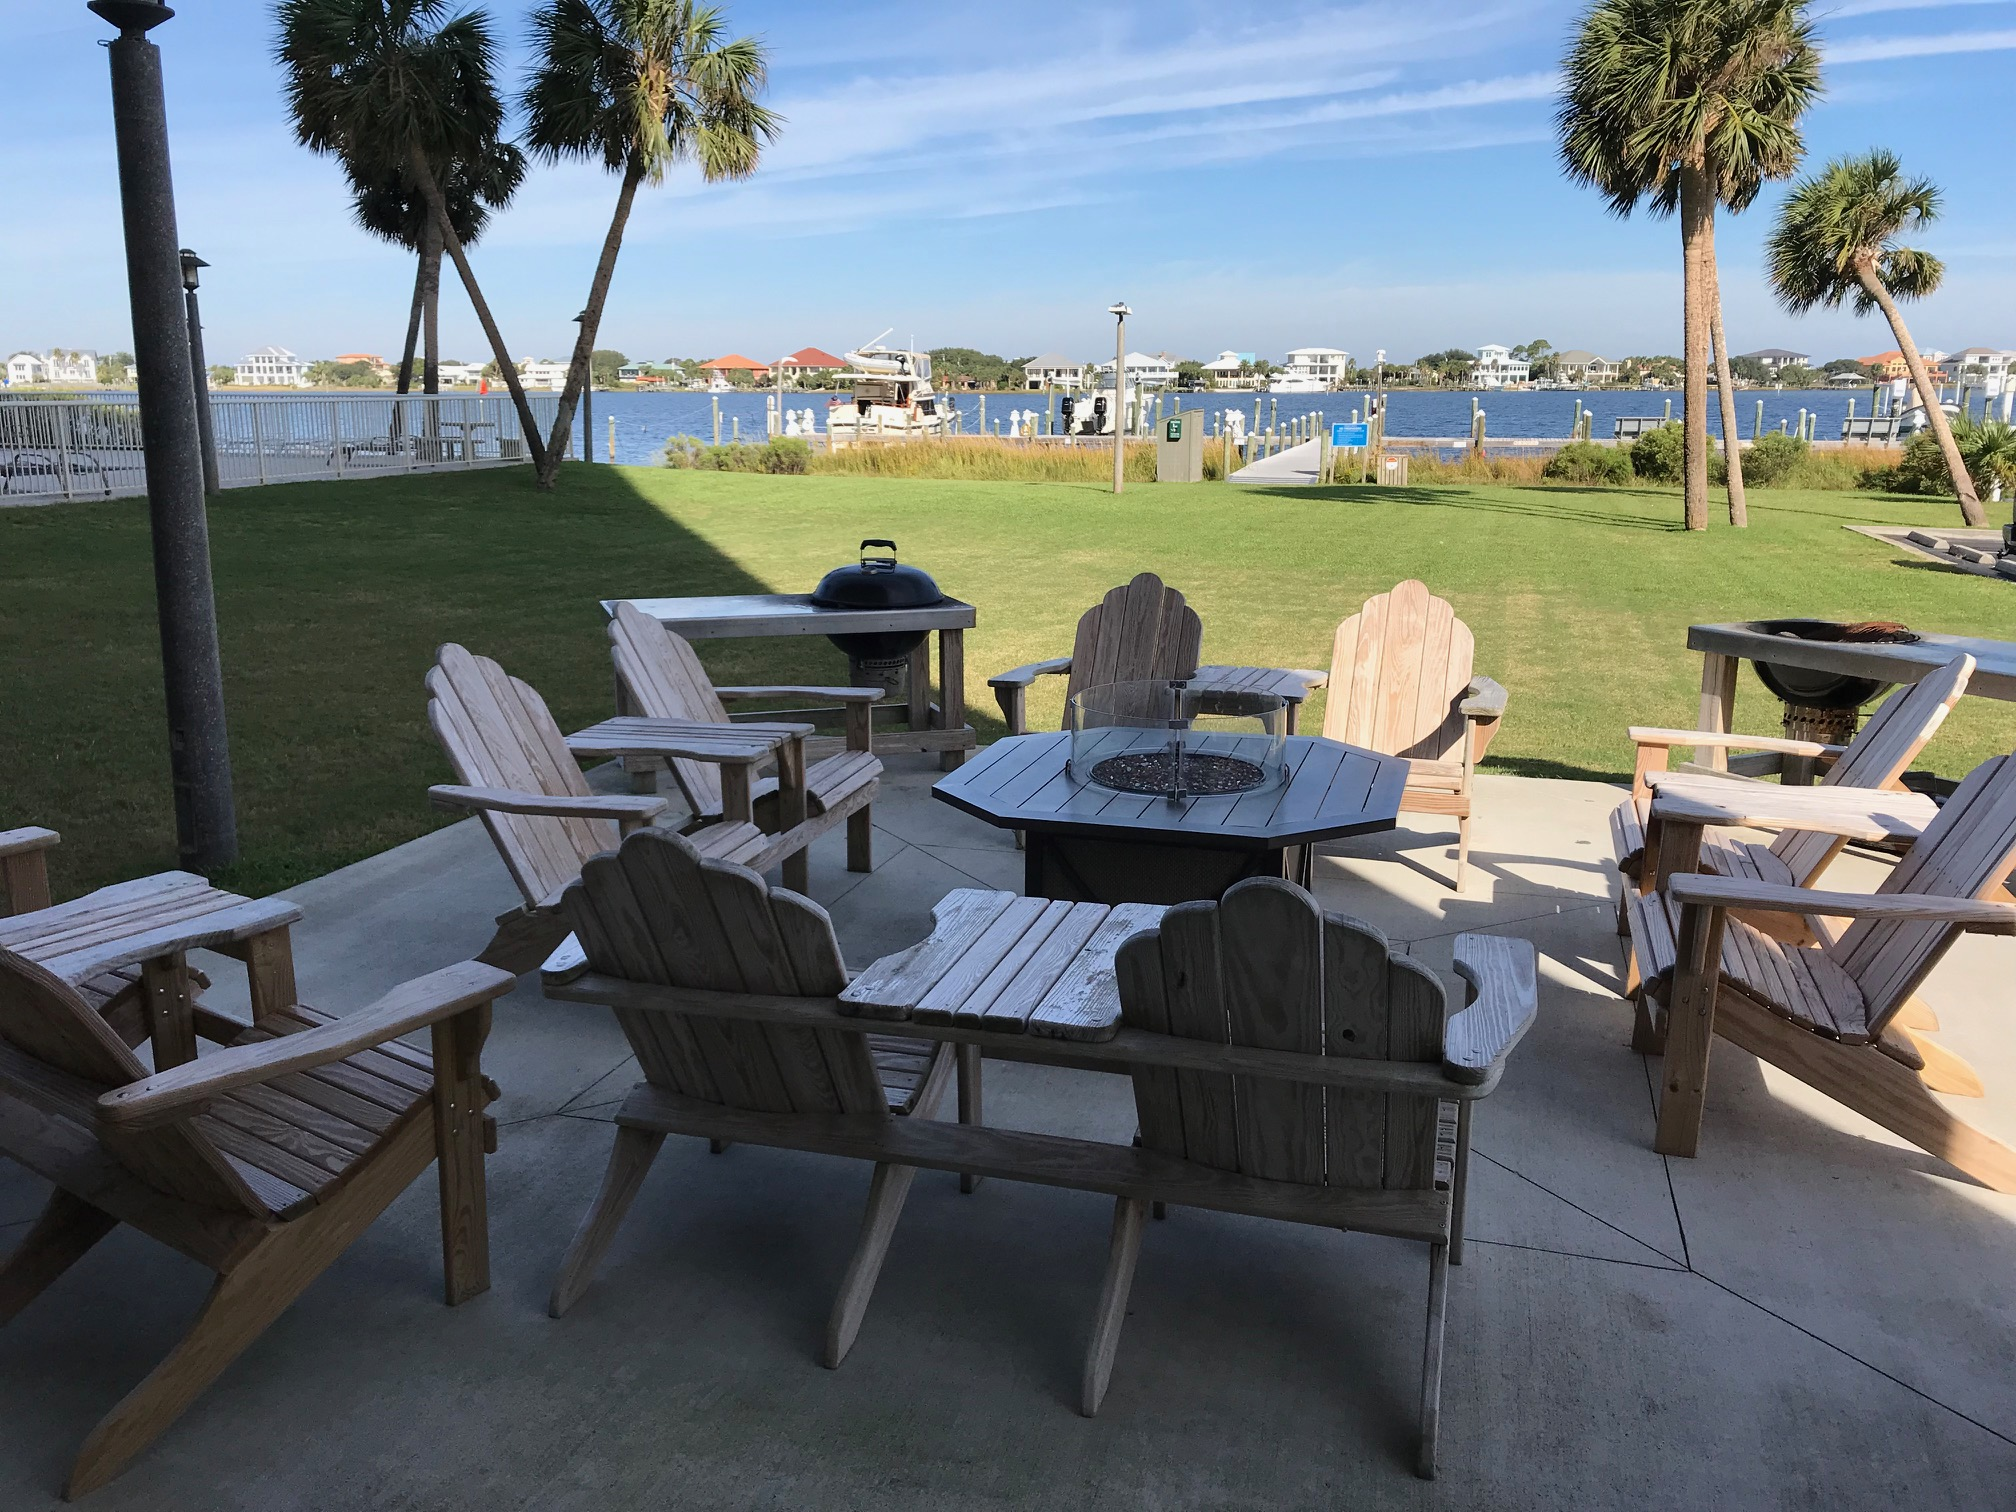 Sabine Yacht & Racquet Club #9D Condo rental in Sabine Yacht & Racquet Club ~ Pensacola Beach Condo Rentals by BeachGuide in Pensacola Beach Florida - #26